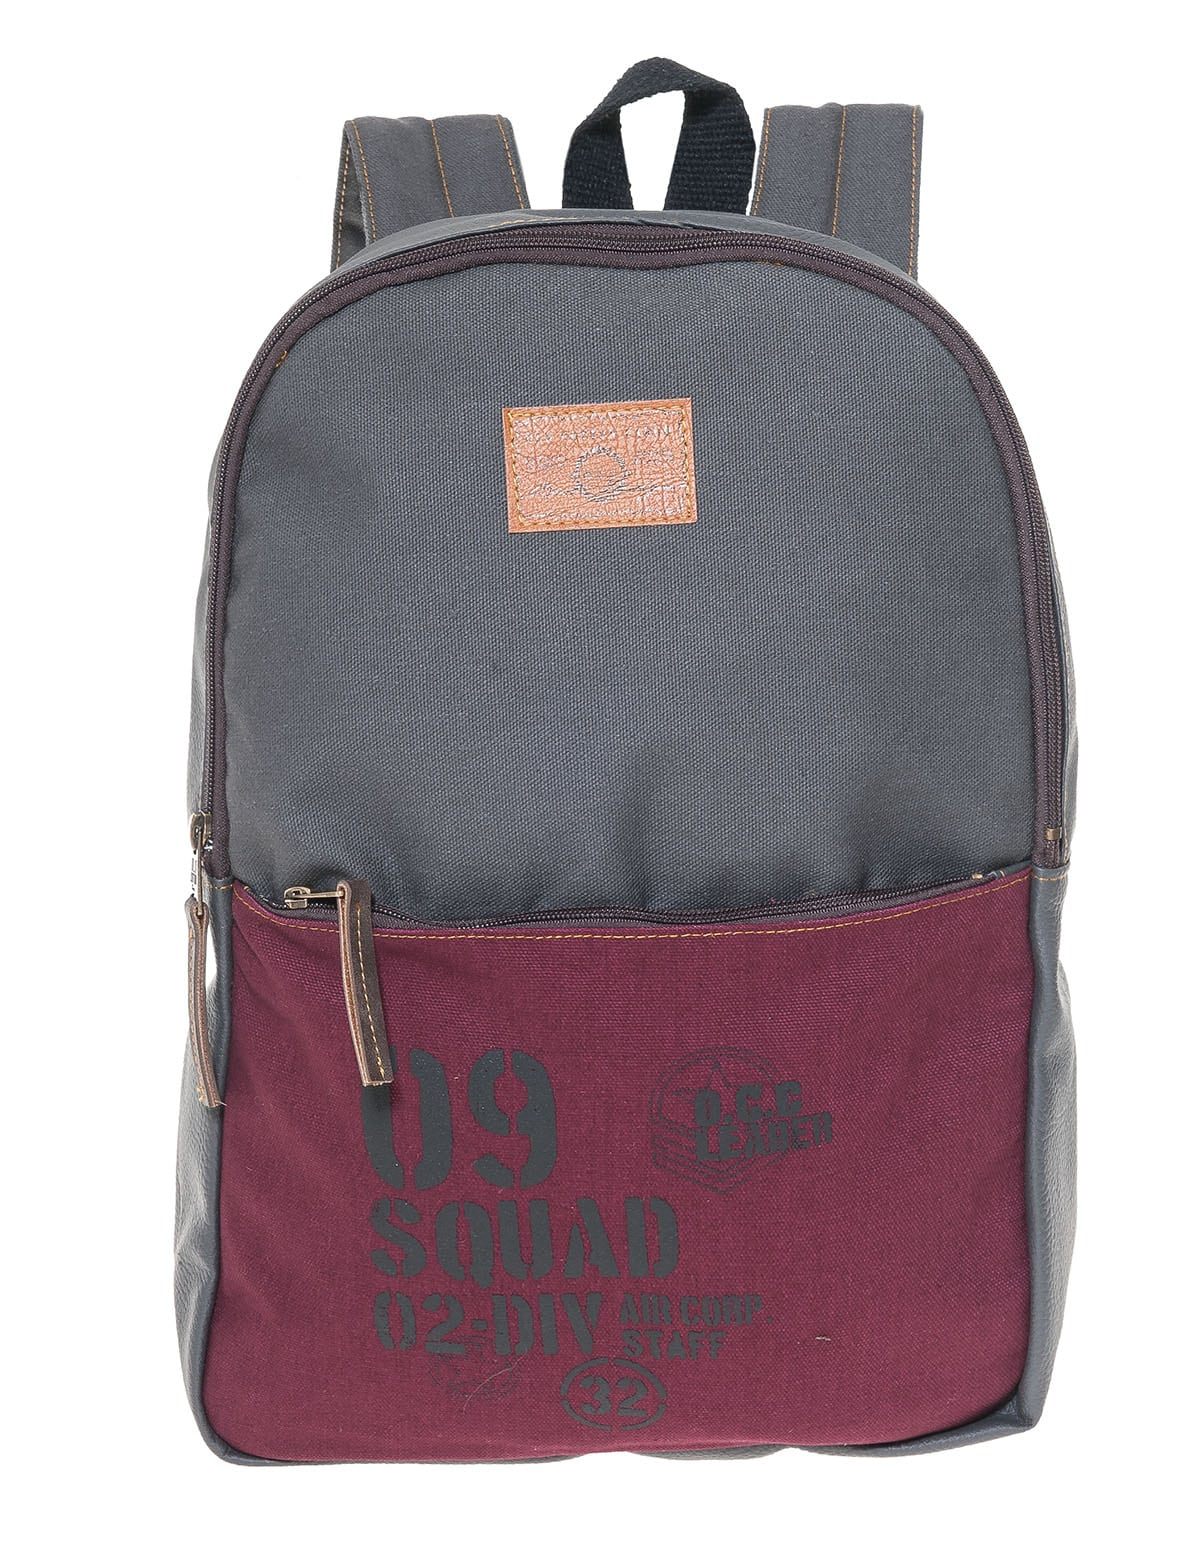 5423dbf45b Χειροποίητο σακίδιο πλάτης (backpack) - vactive.gr